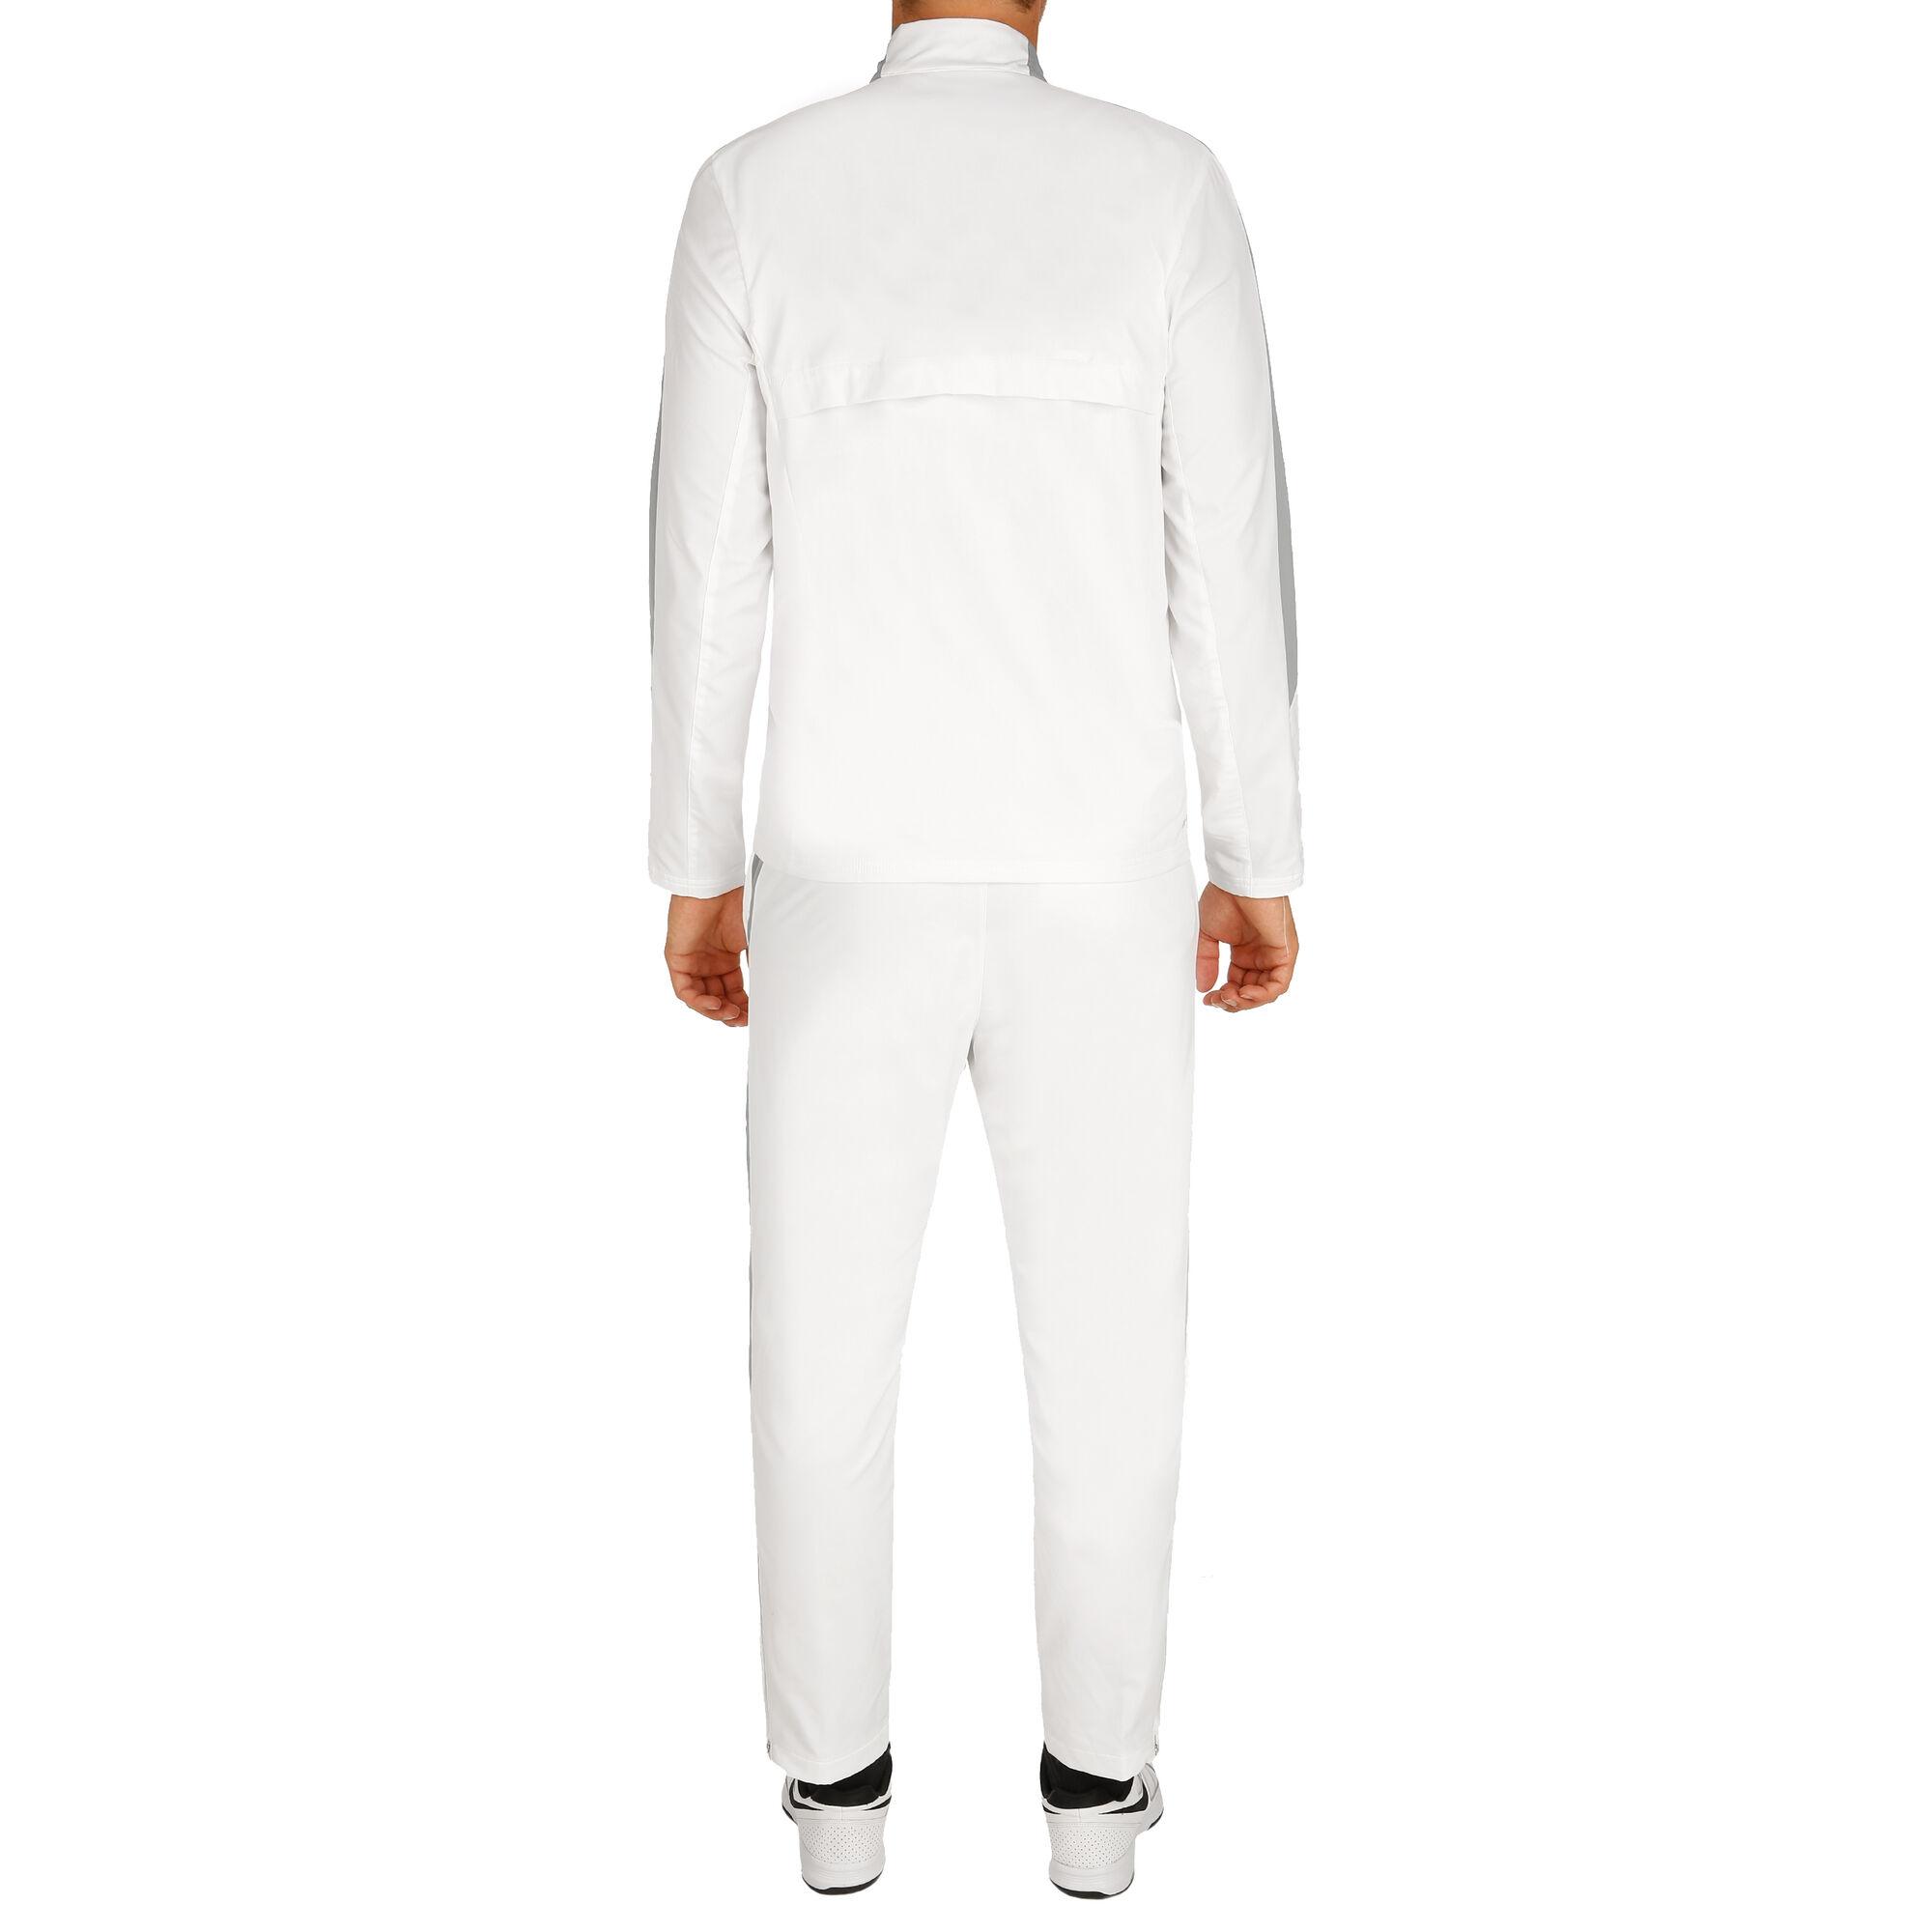 Nike Trainingsanzug Weiß